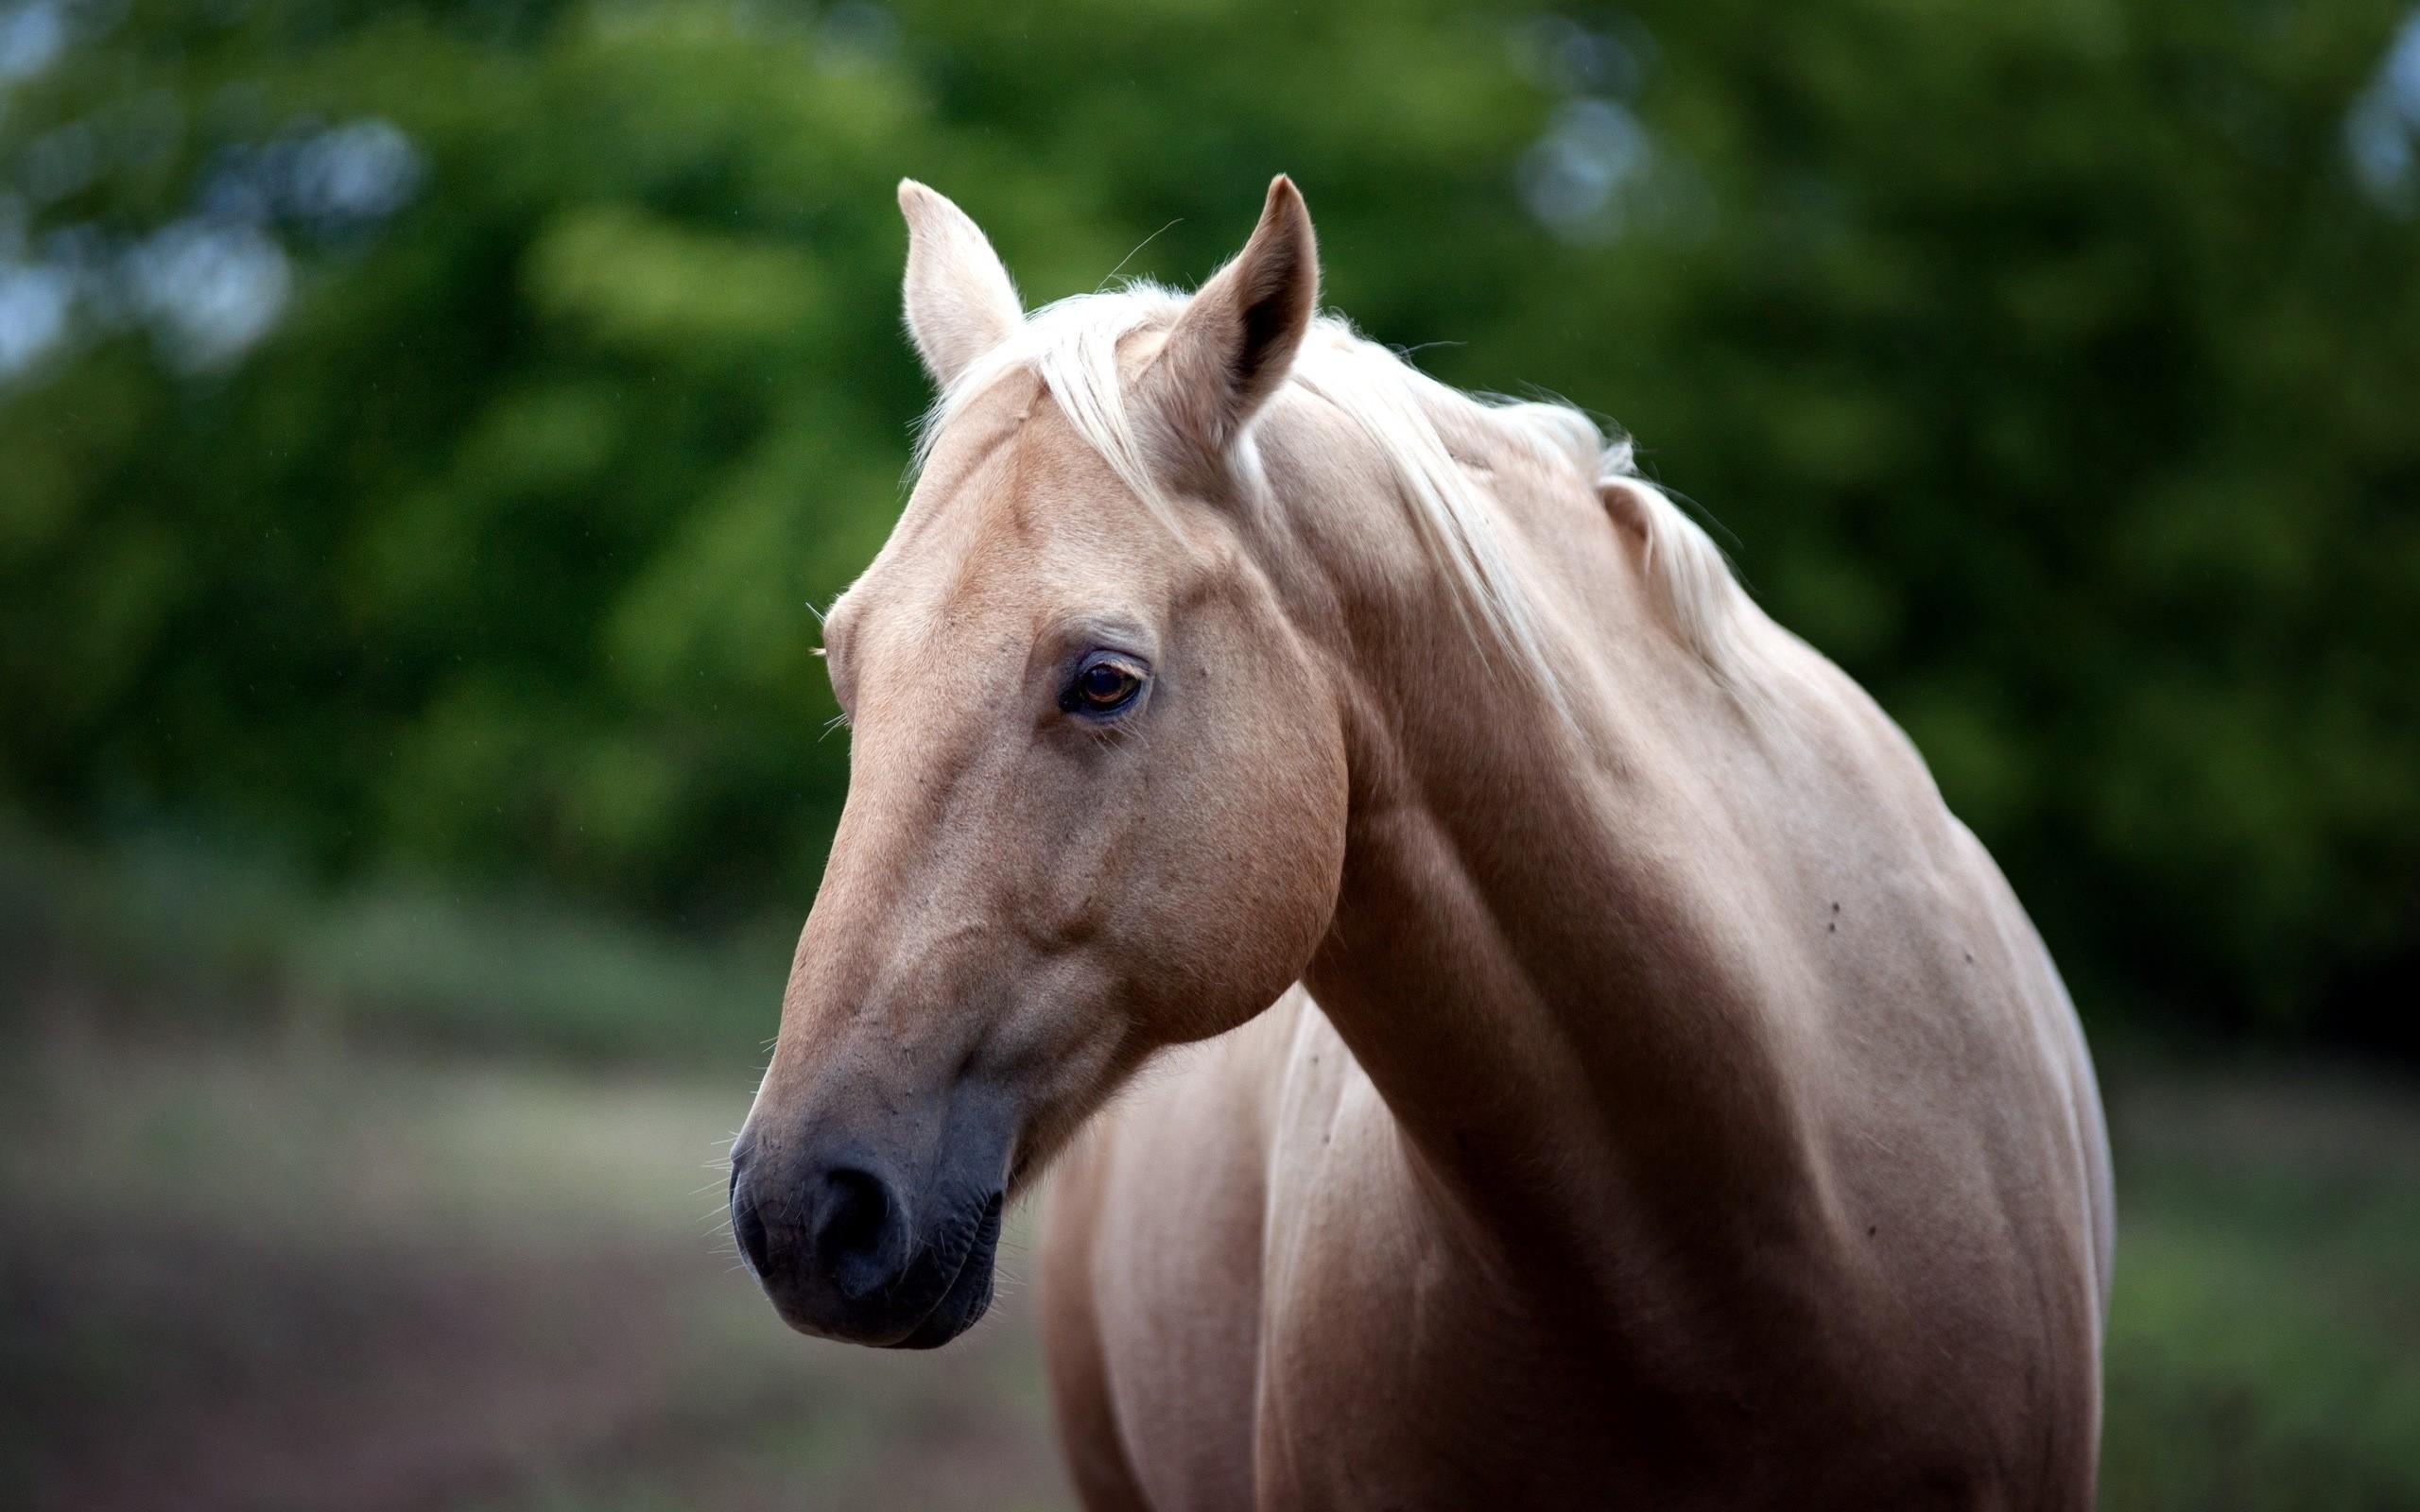 Arabian horse photo gallery wallpaper 53 images - Arabian horse pics ...